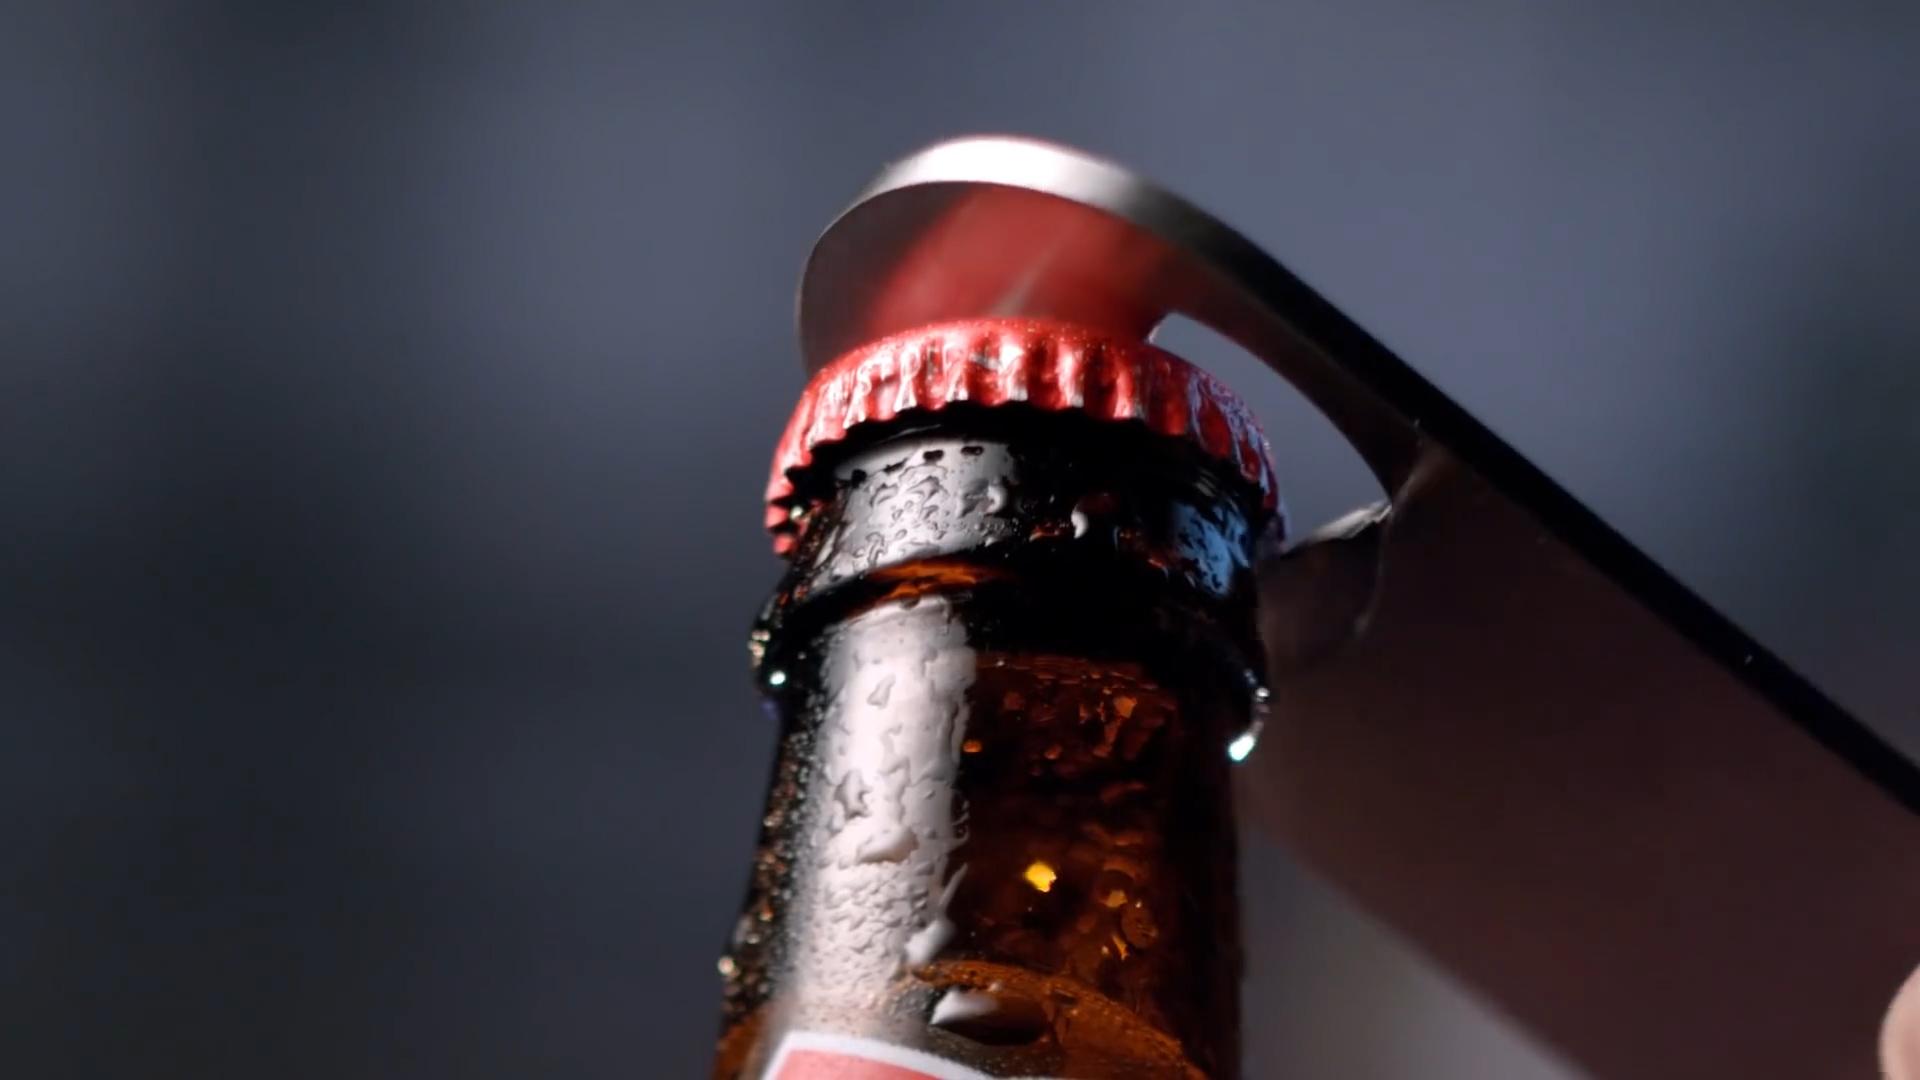 Budweiser - Typical American